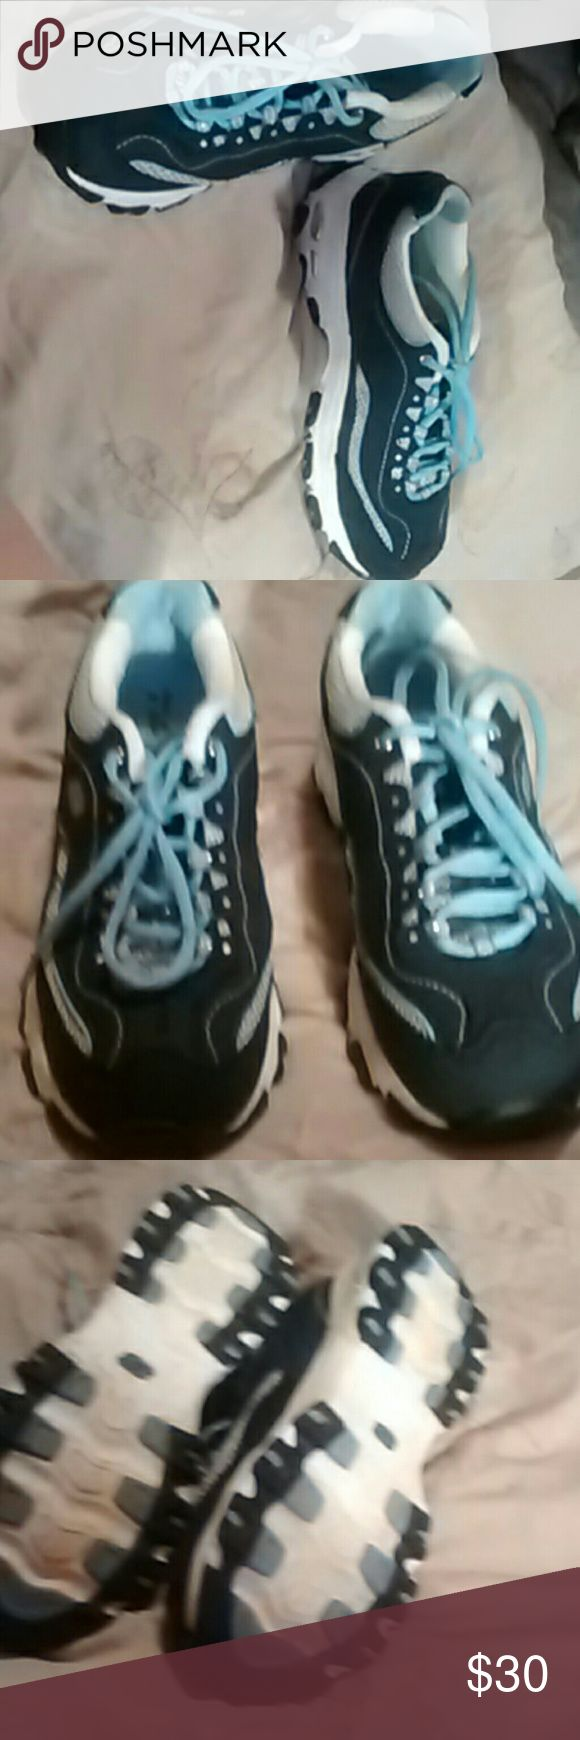 Sketchers Sport D'lites Sneakers New Dark blue and light blue colors Skechers Shoes Athletic Shoes